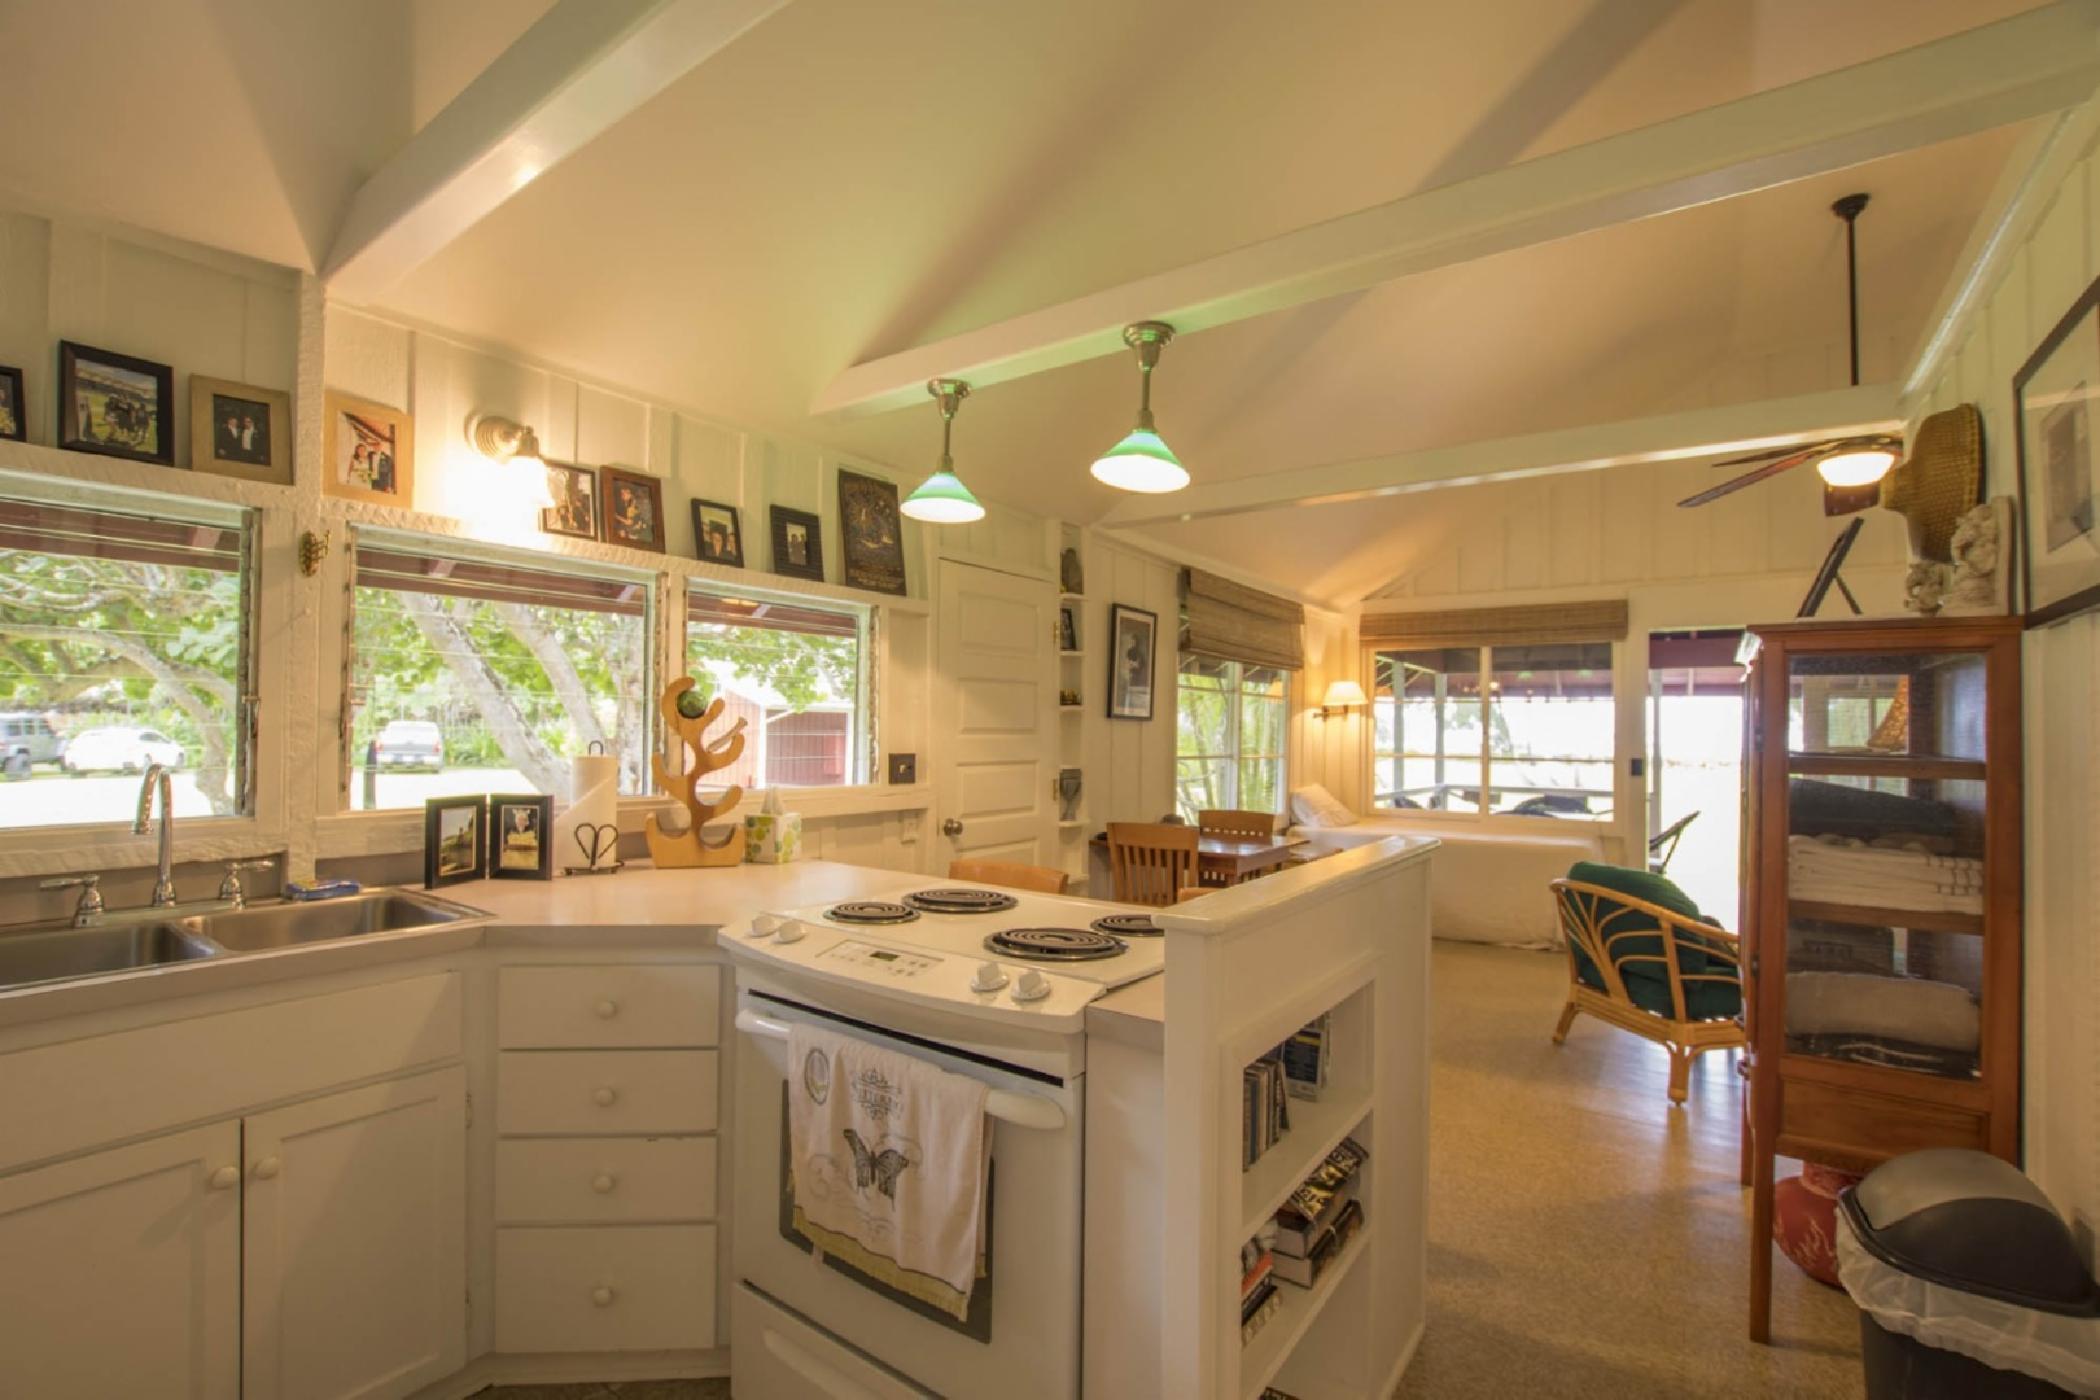 guest-house-kitchen-2.jpeg